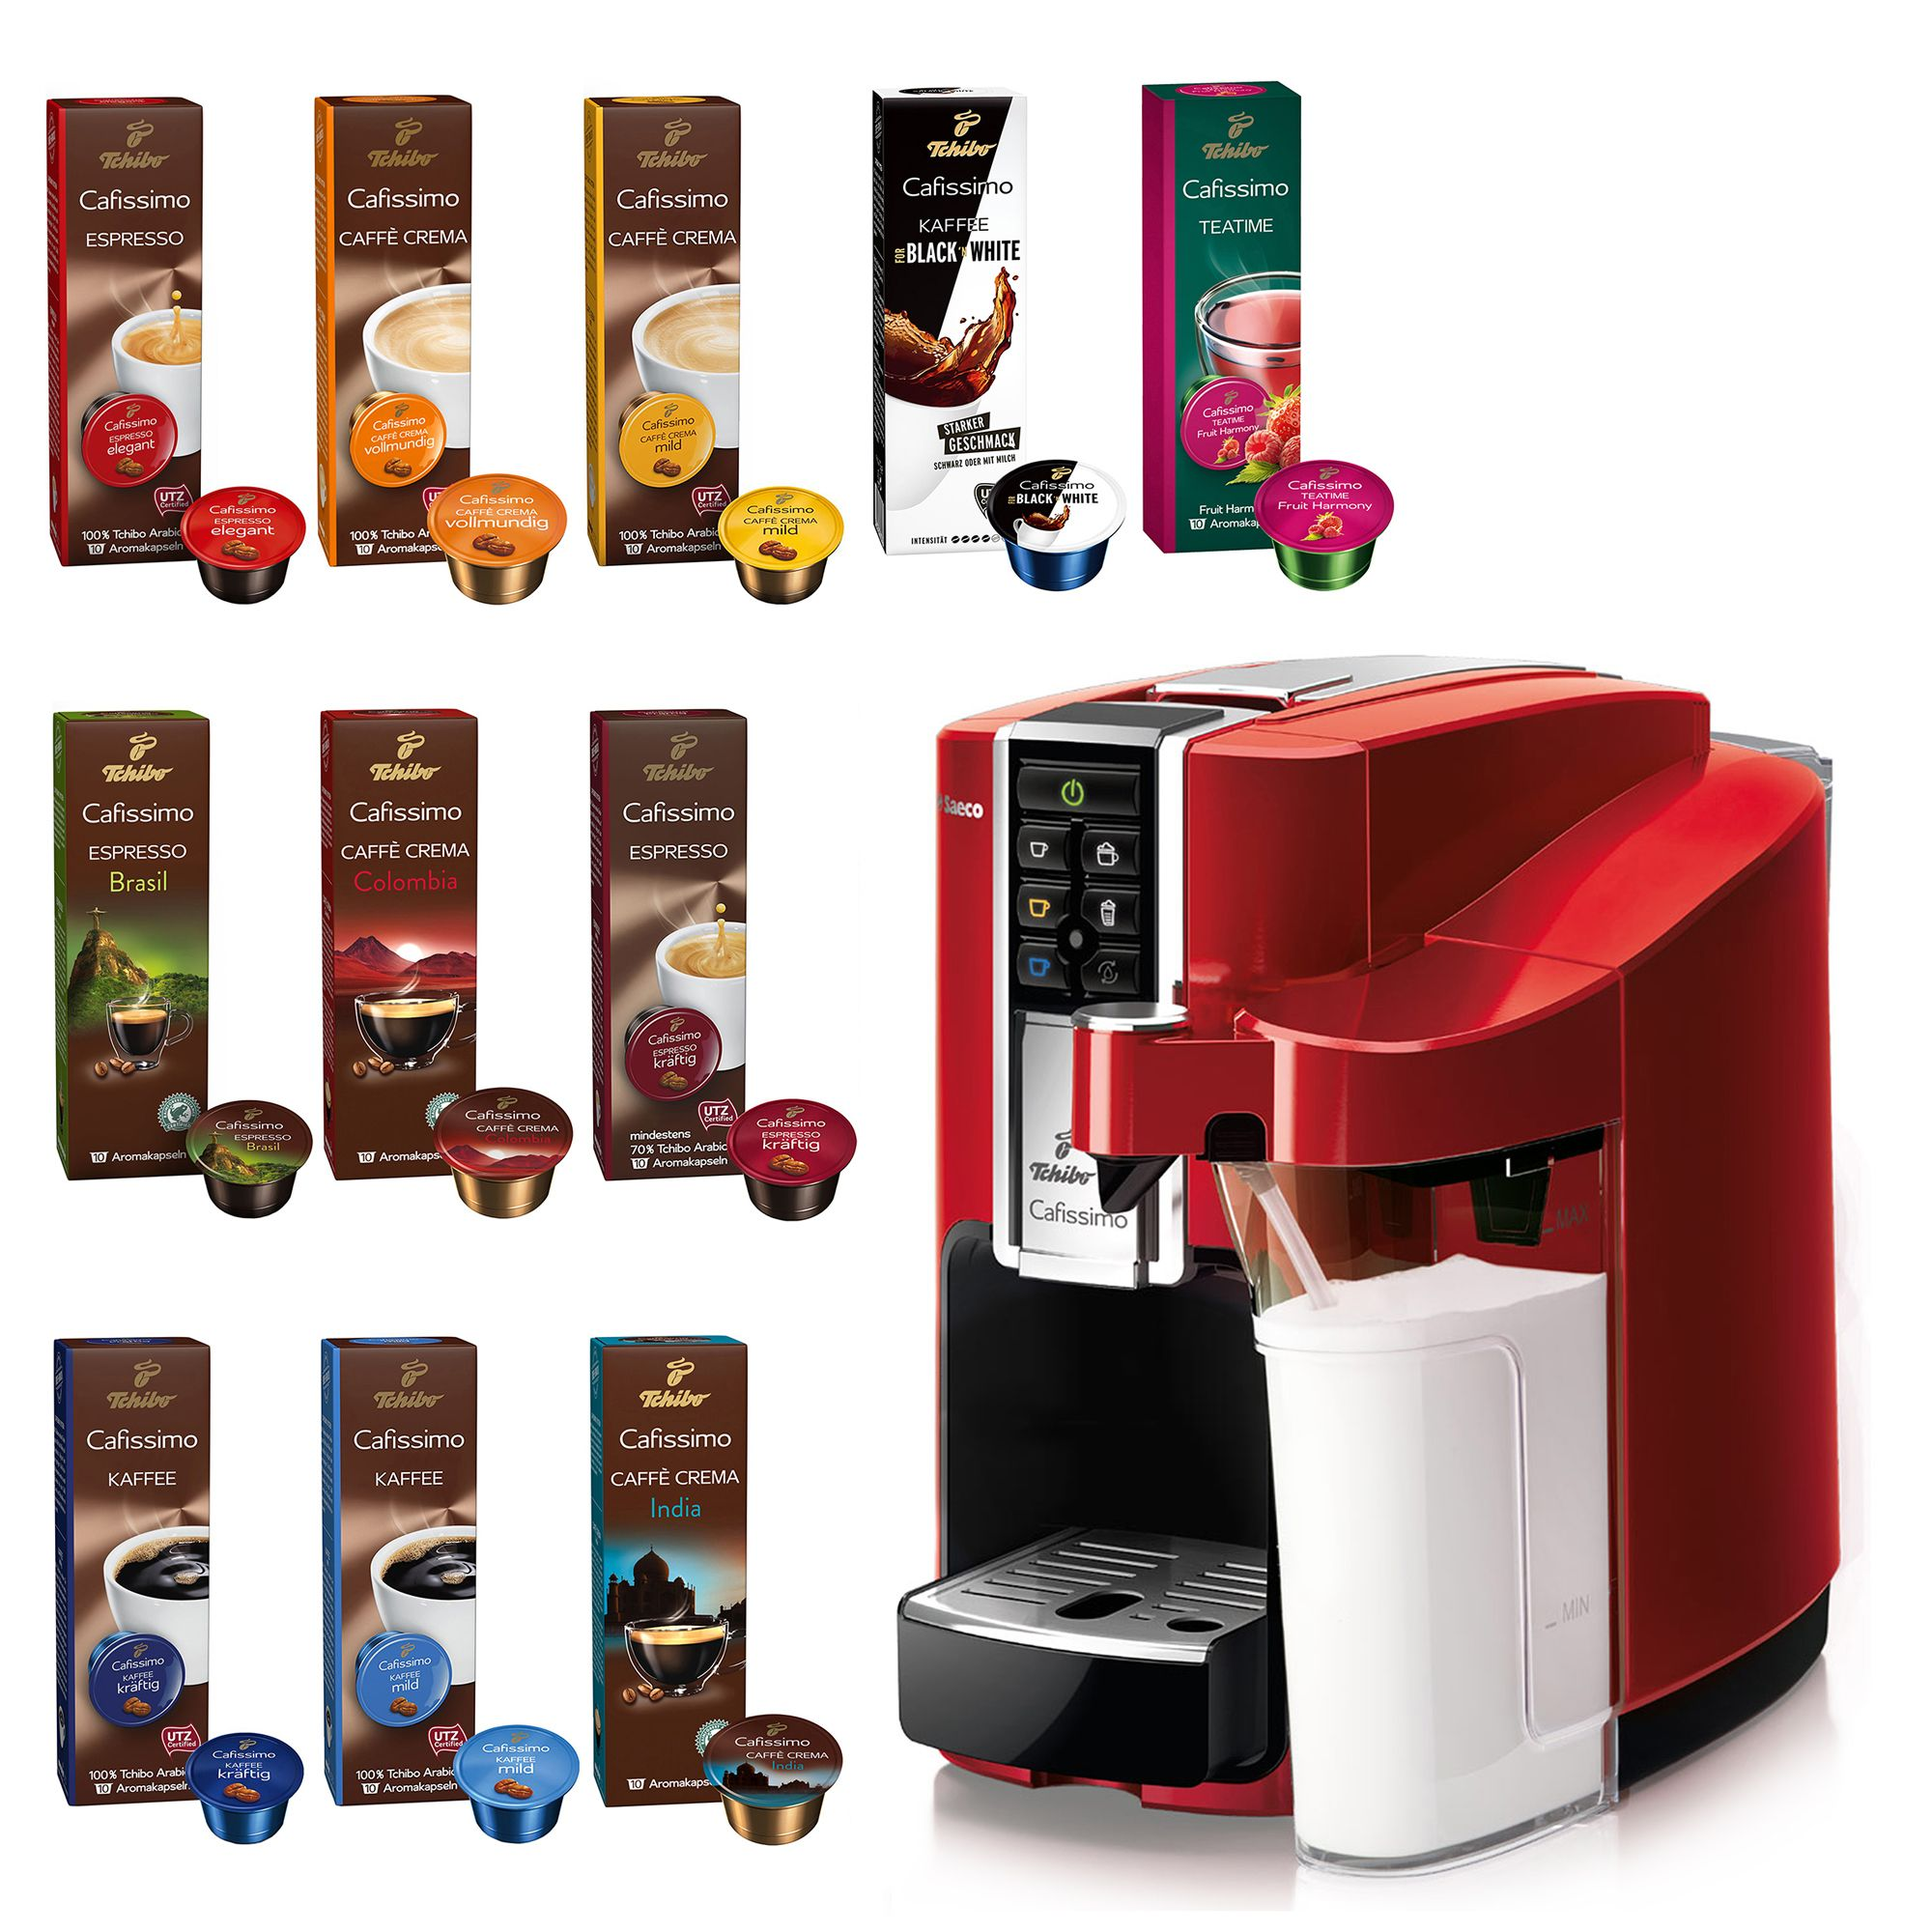 TCHIBO Cafissimo Latte Kapselmaschine Kaffee U0026 Tee Inkl. 110 Kapseln   Page  1 U2014 QVC.de